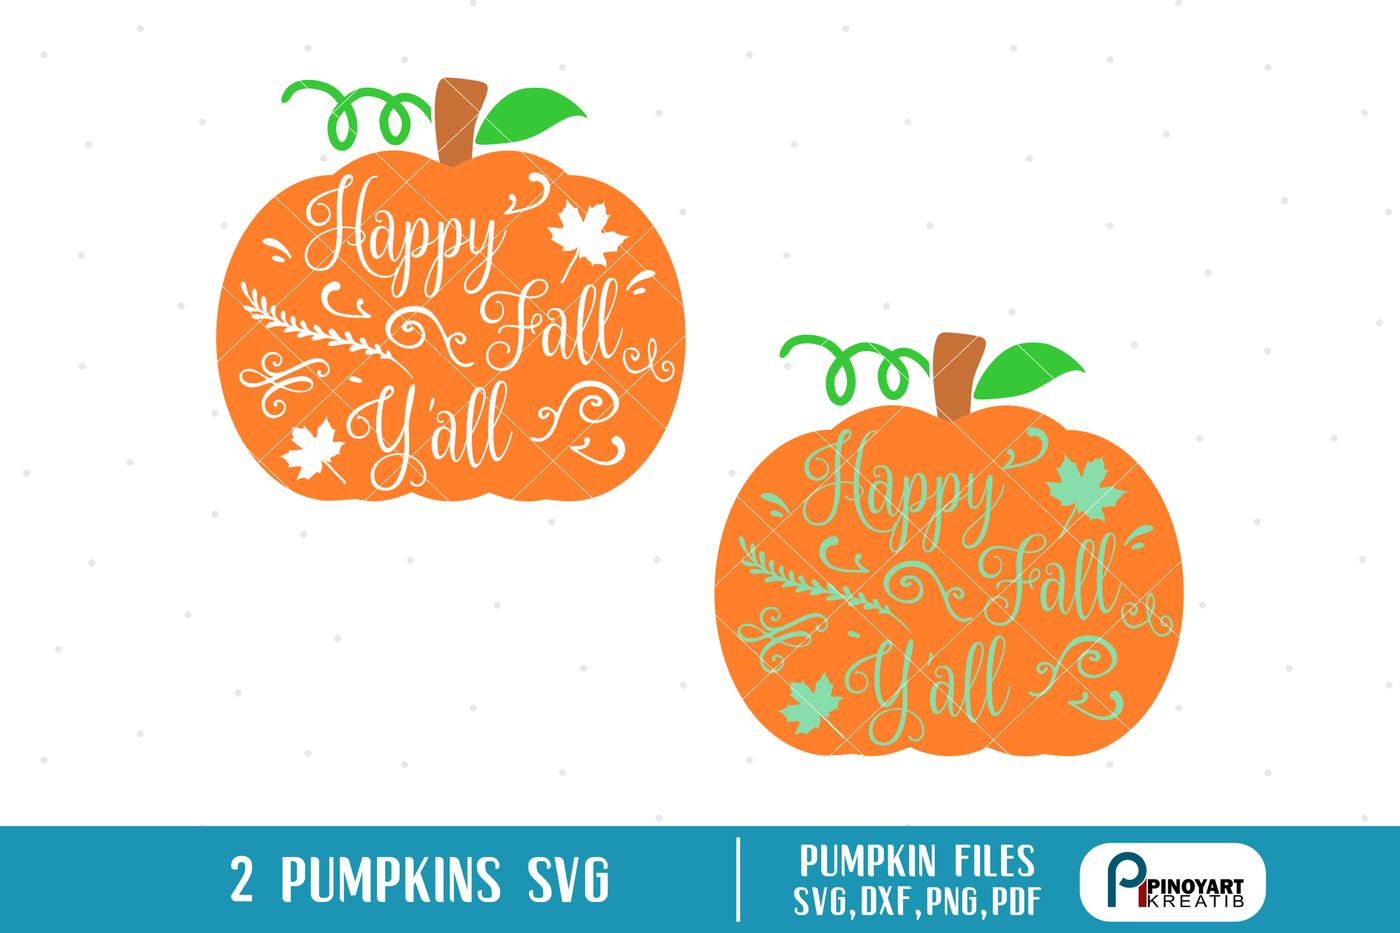 Pumpkin Svg File Happy Fall Y All Svg Pumkpin Dxf Quote Svg Phrase